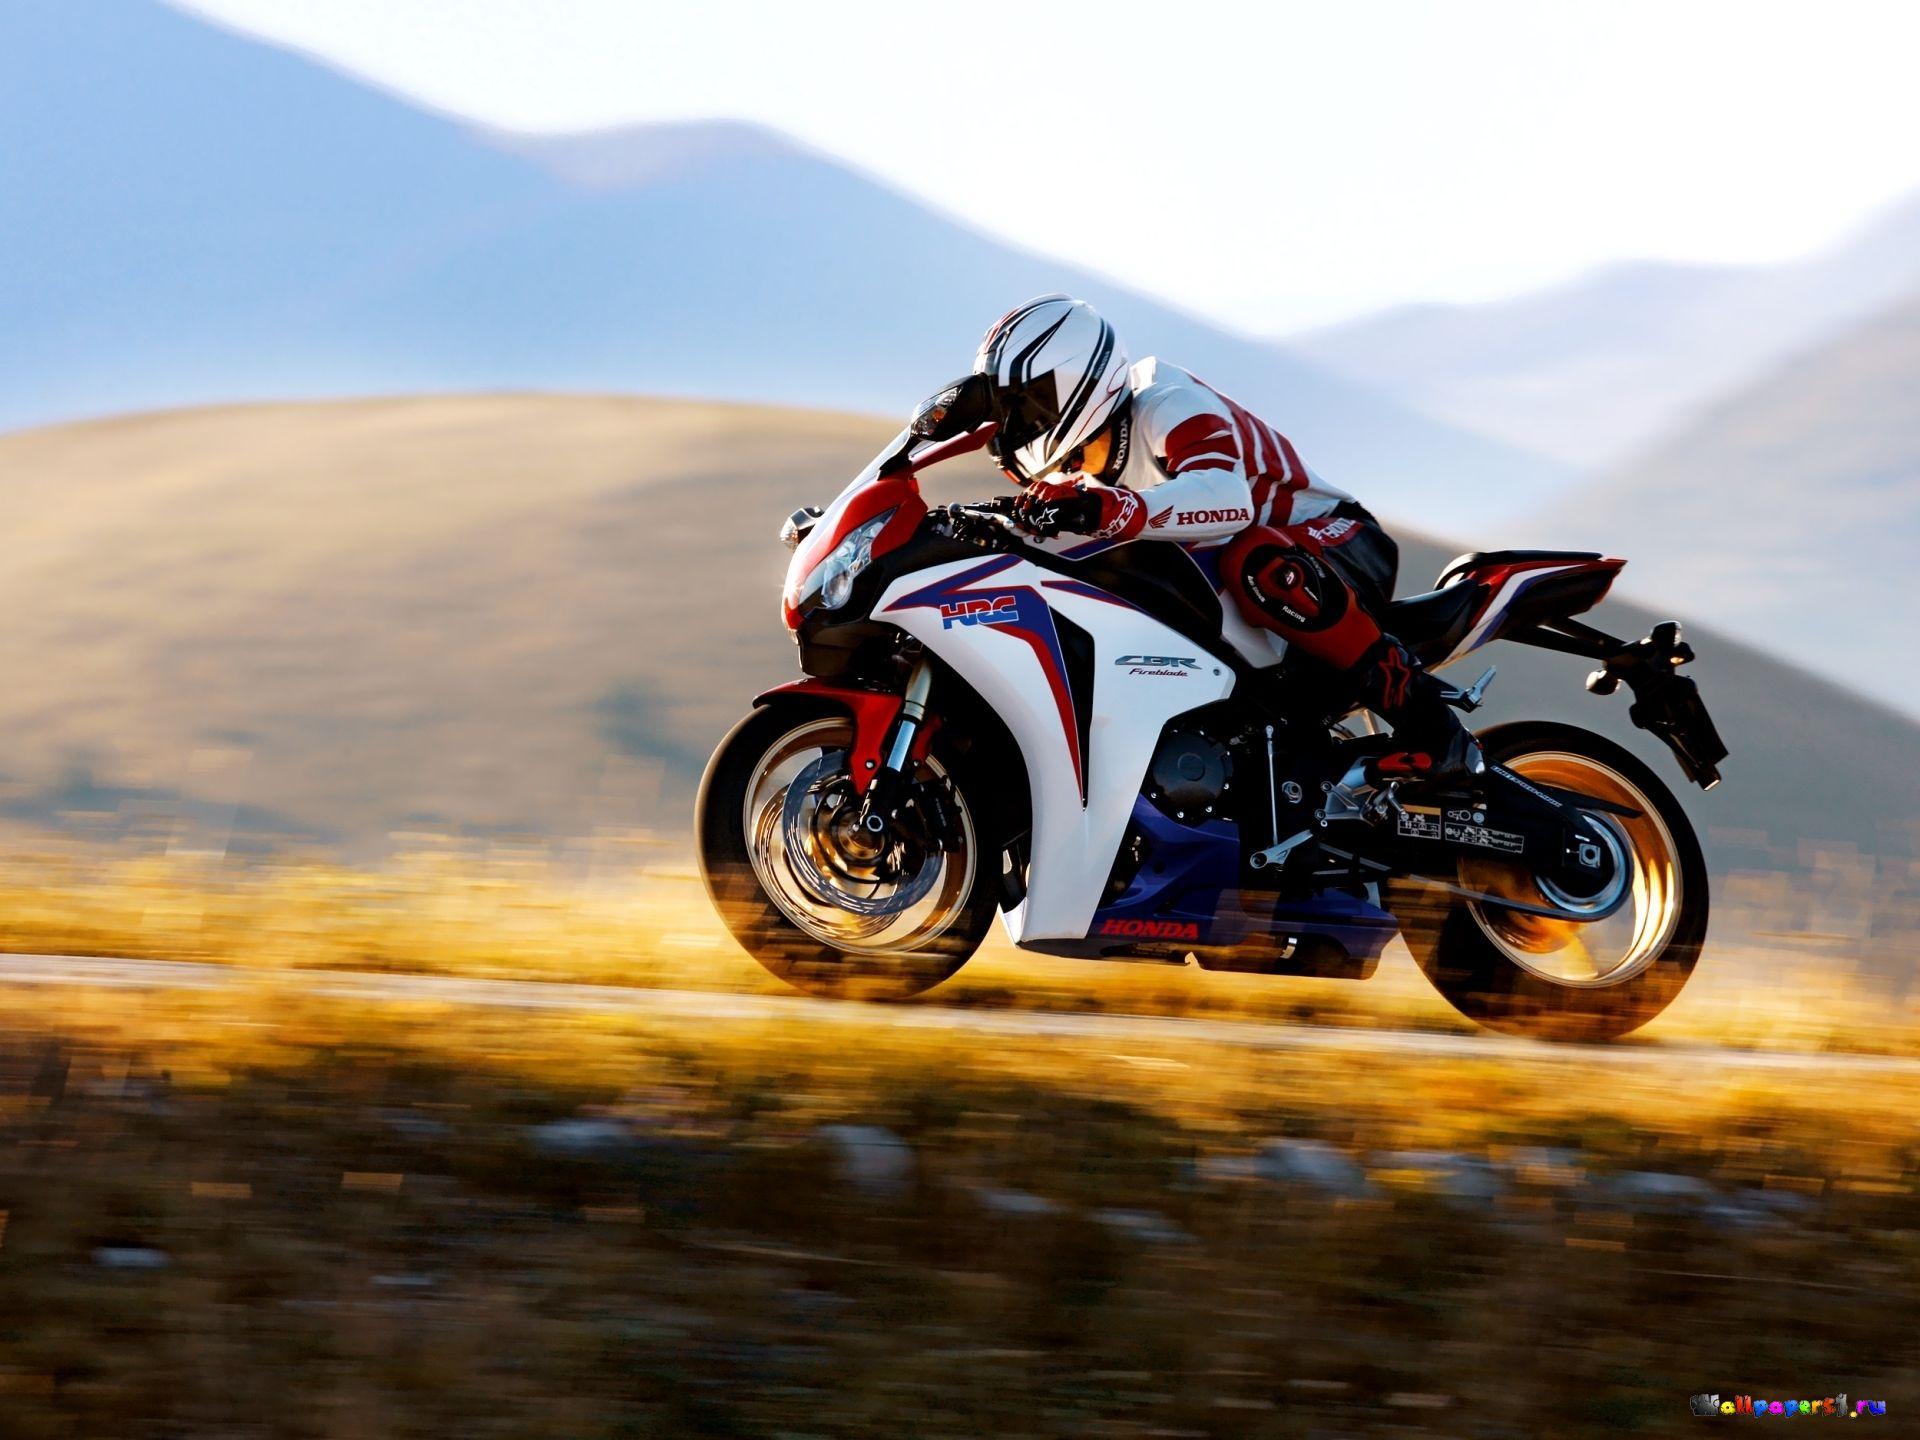 Moto, Vectrix без смс